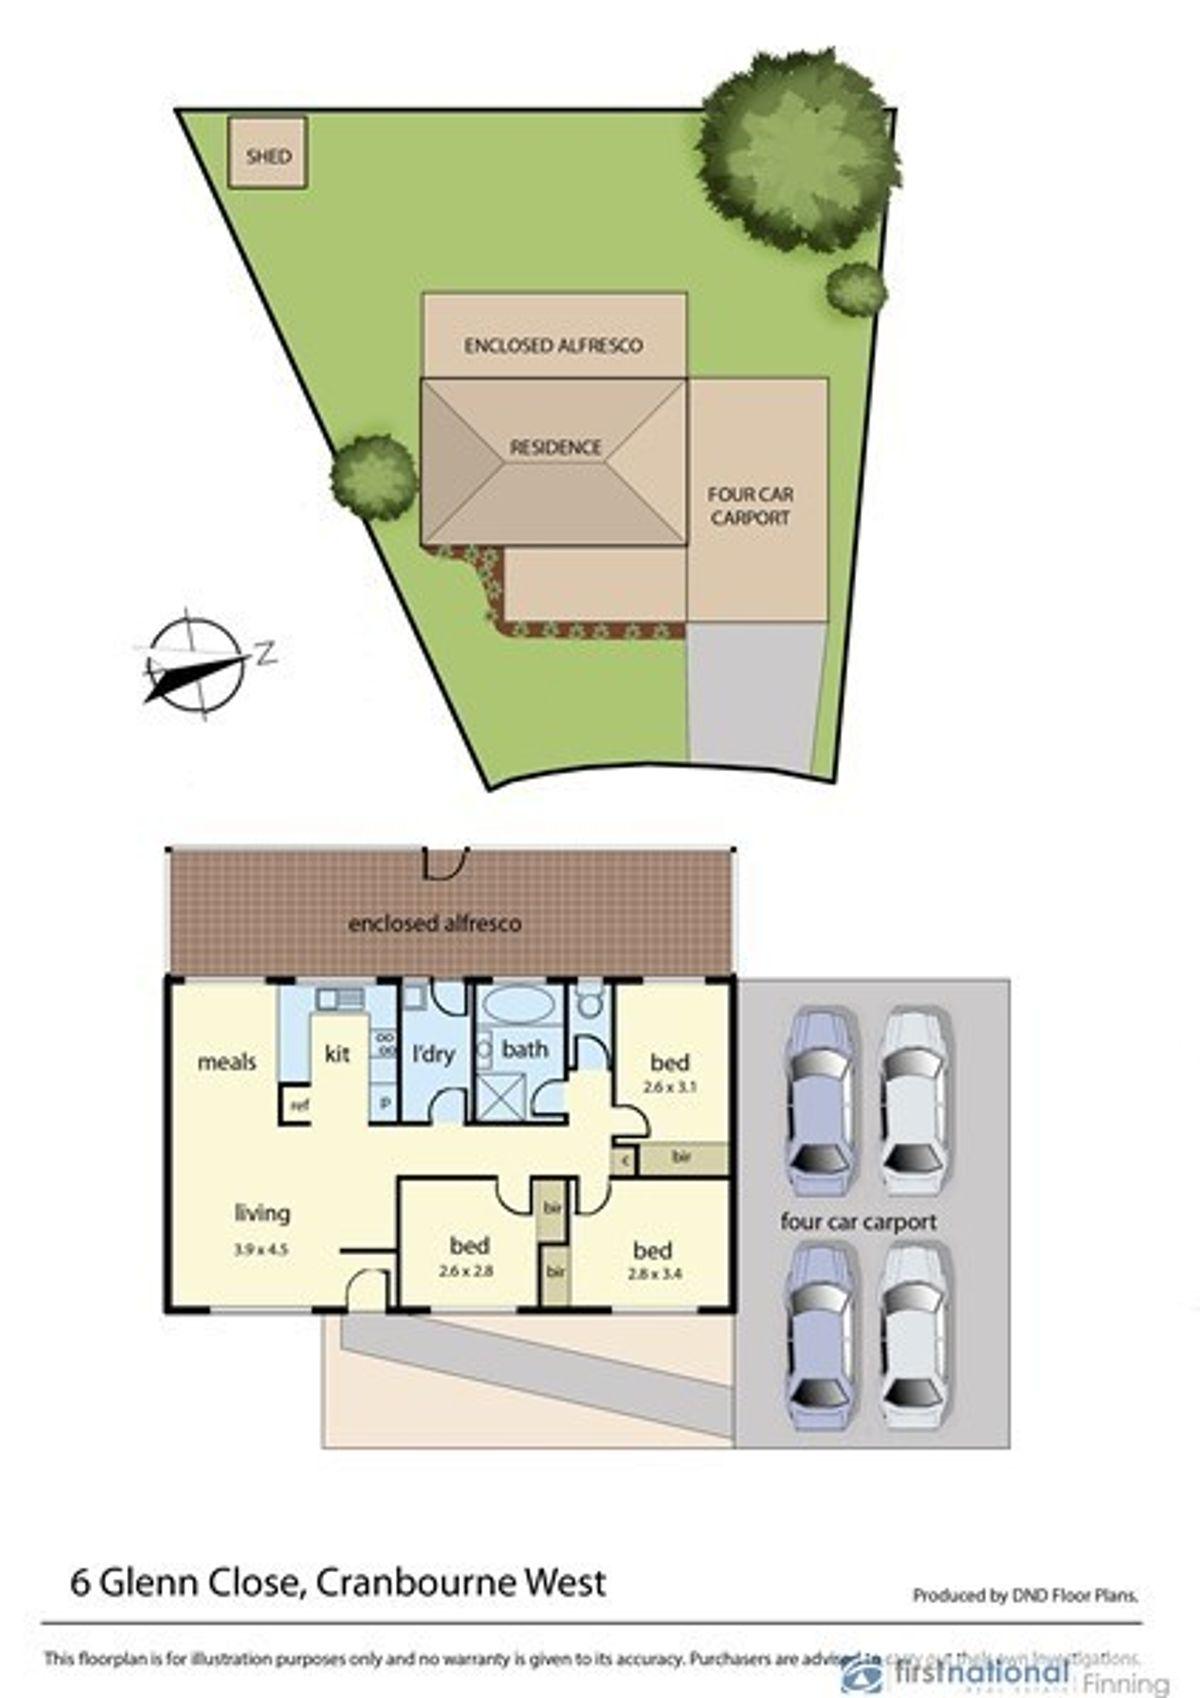 6 Glenn Close, Cranbourne West, VIC 3977